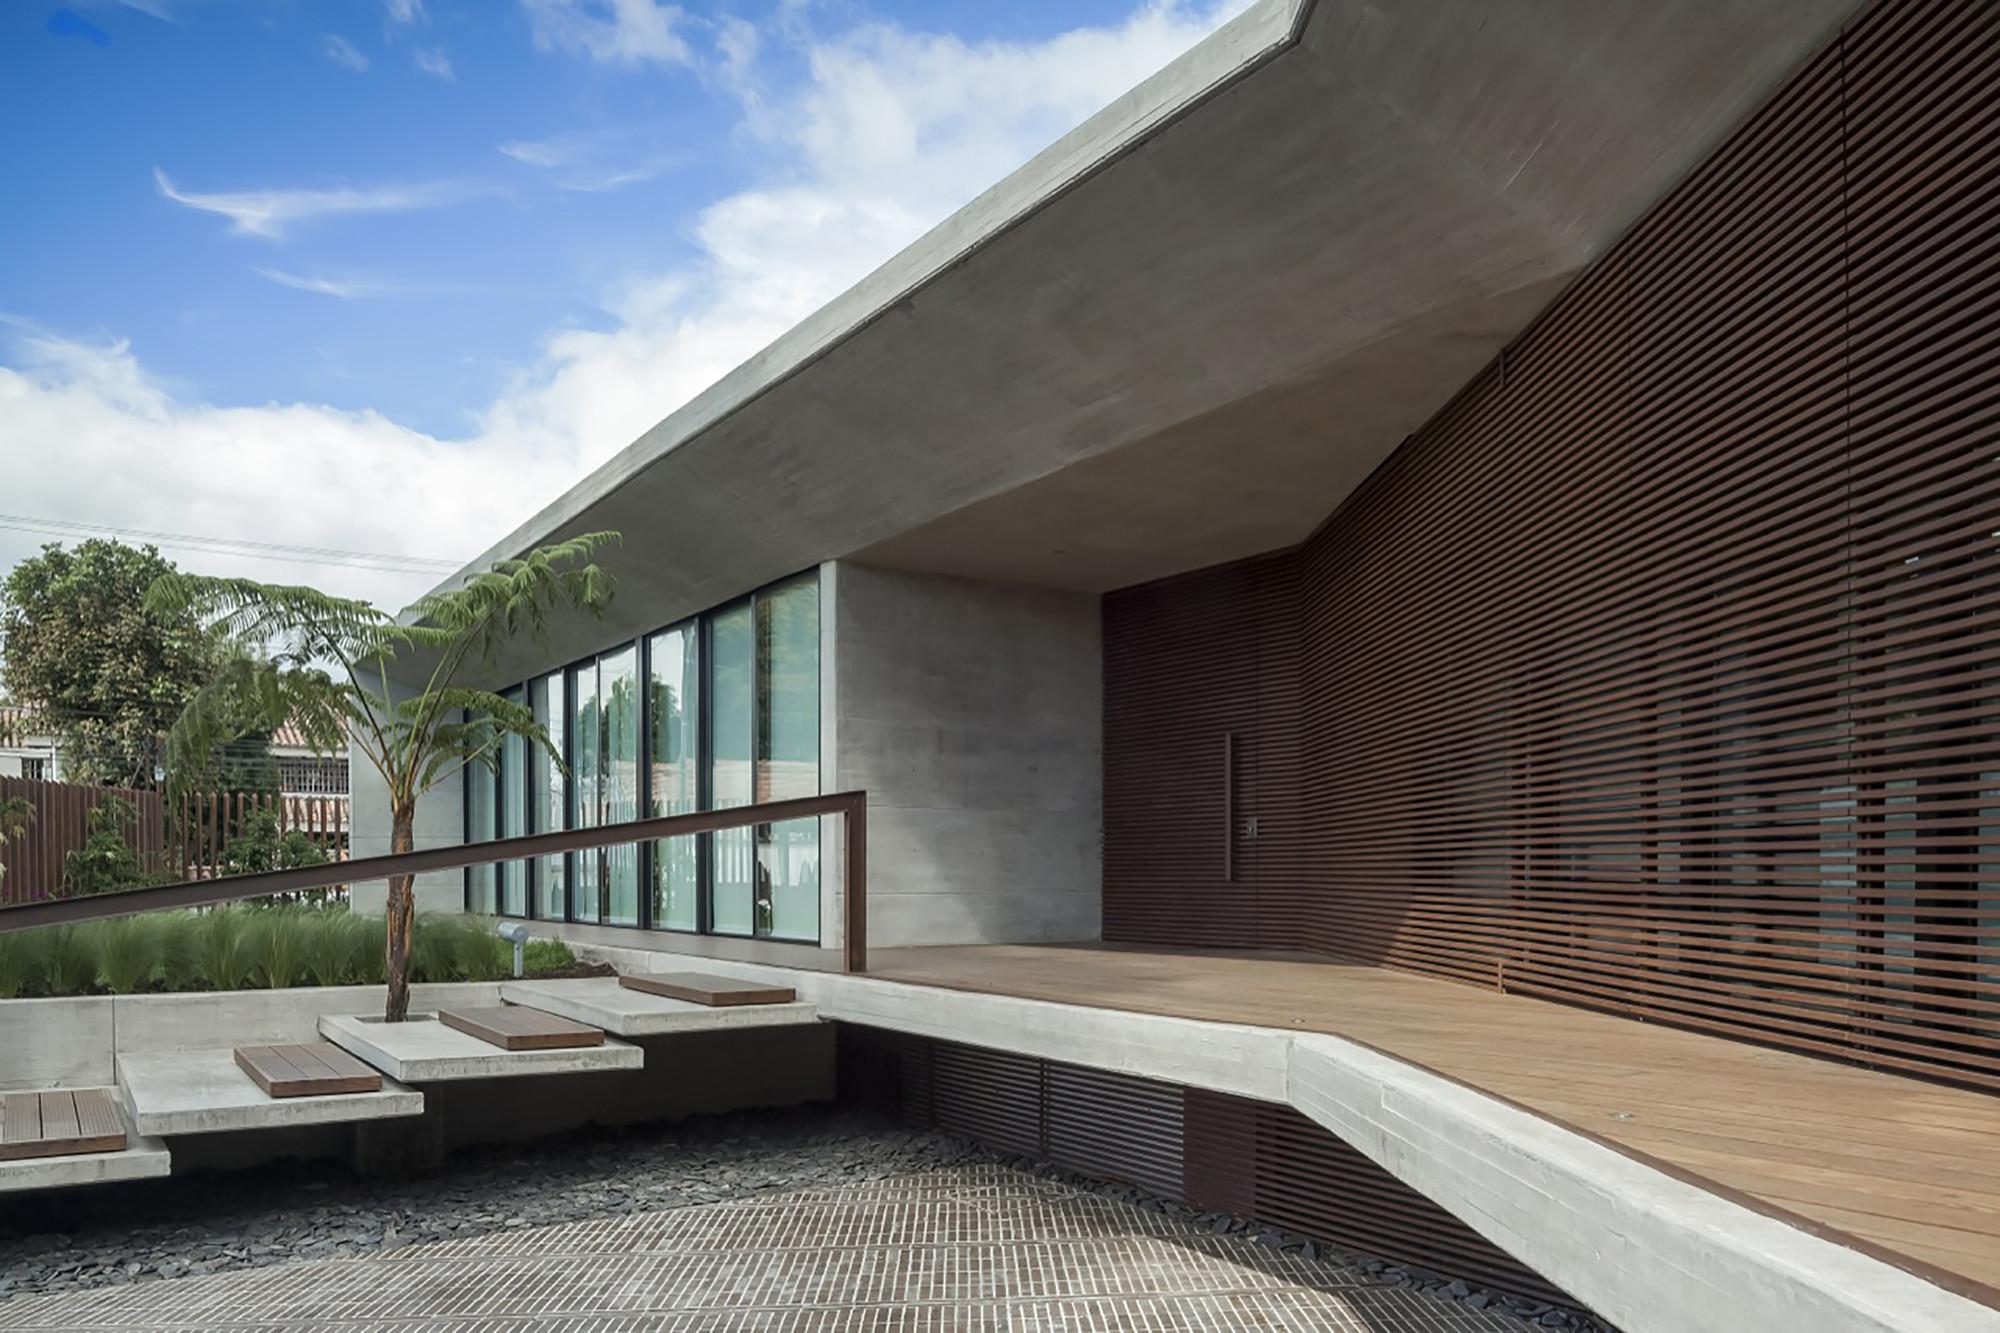 Galeria de casa cr h h arquitectos 11 for Arquitectos para casas